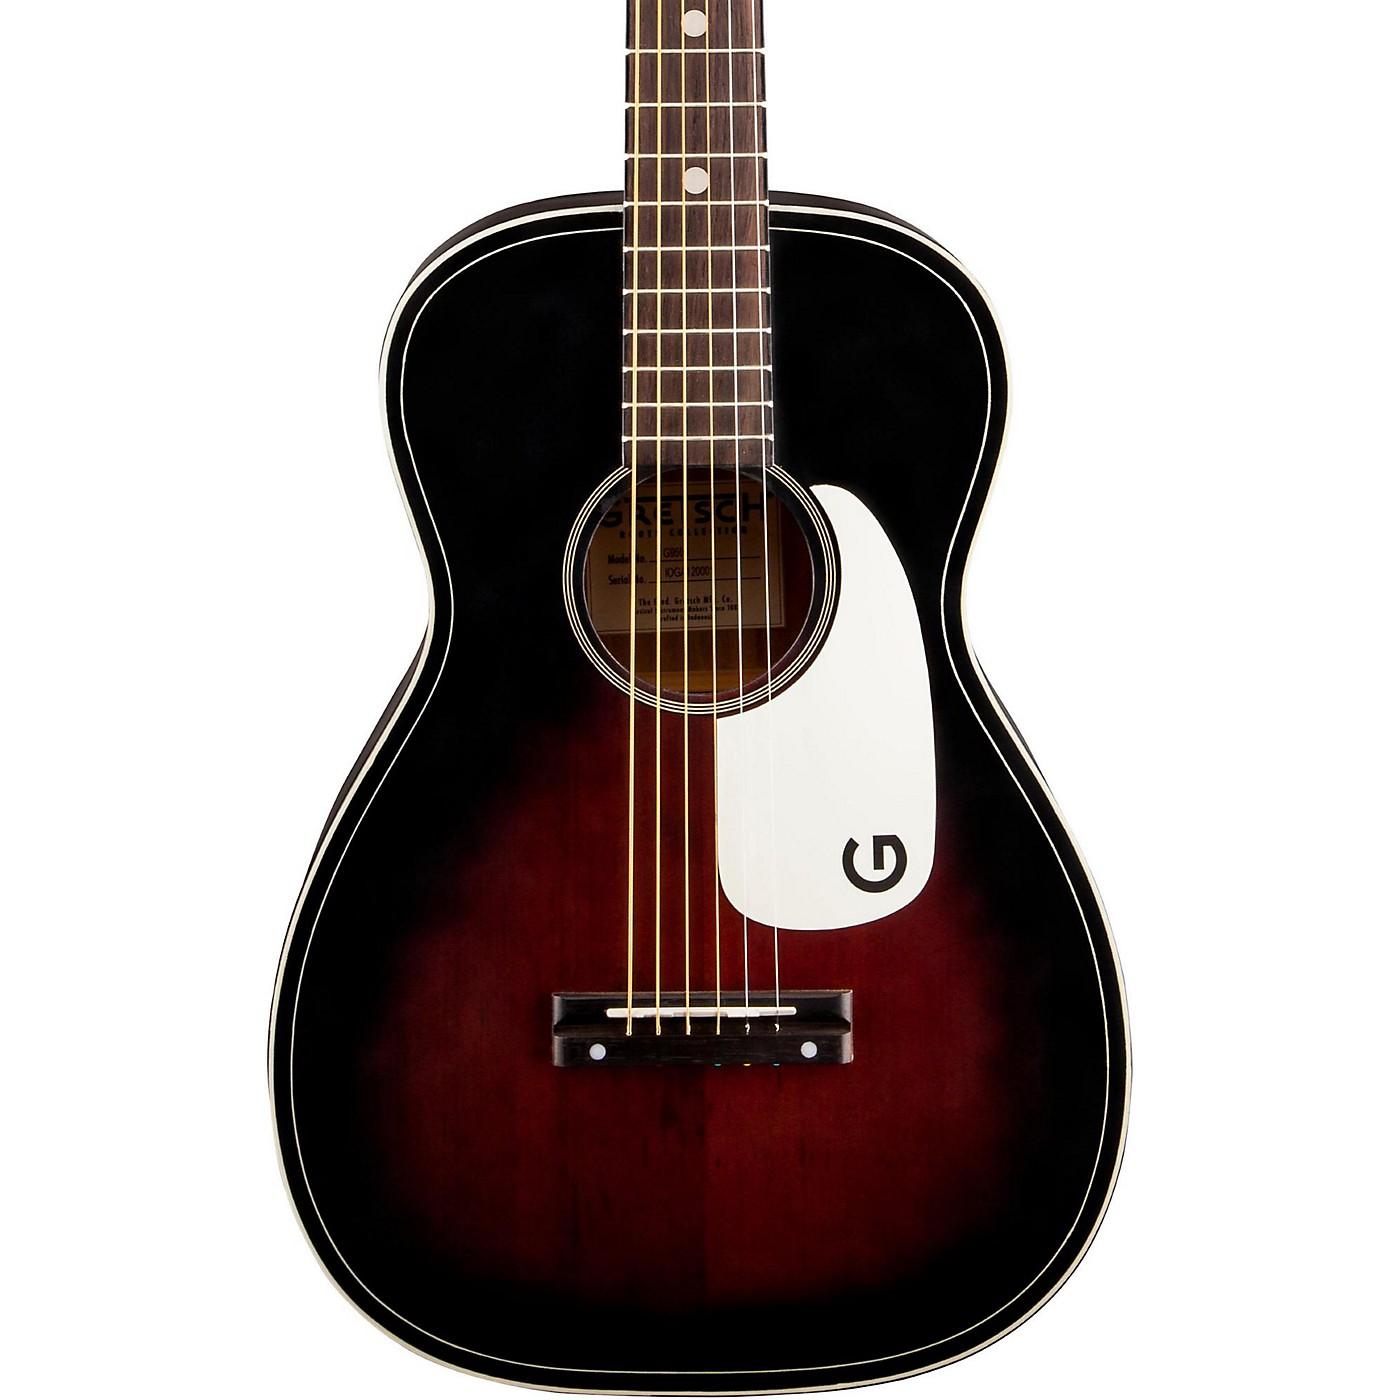 Gretsch Guitars Jim Dandy Flat Top Acoustic Guitar thumbnail